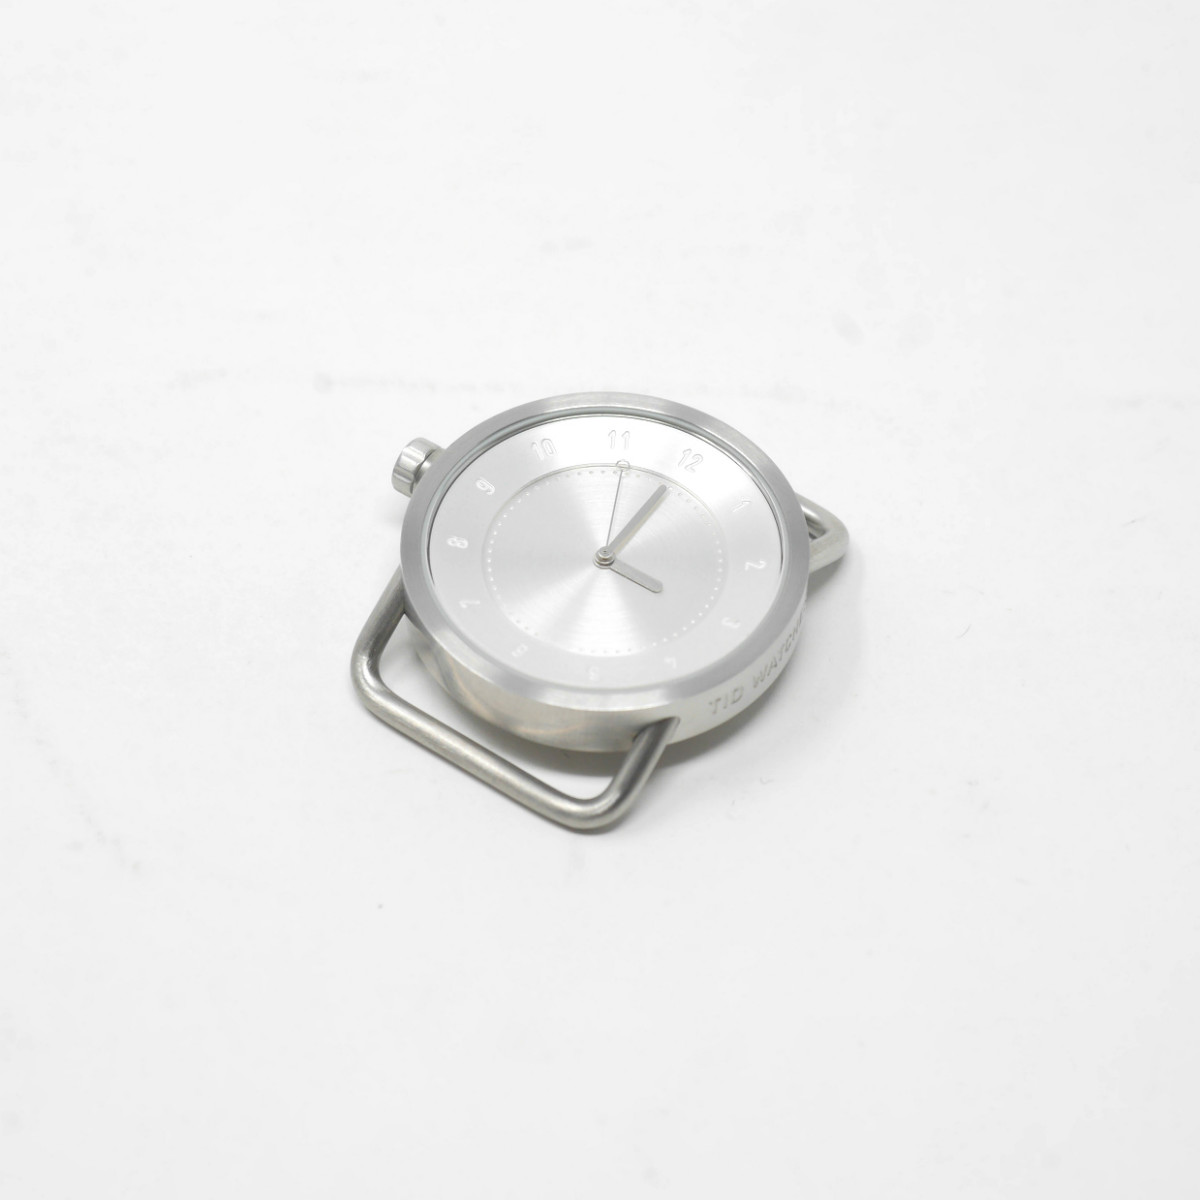 TID Watches No.1 33mm フェイス シルバー(ティッドウォッチ)※バンド別売